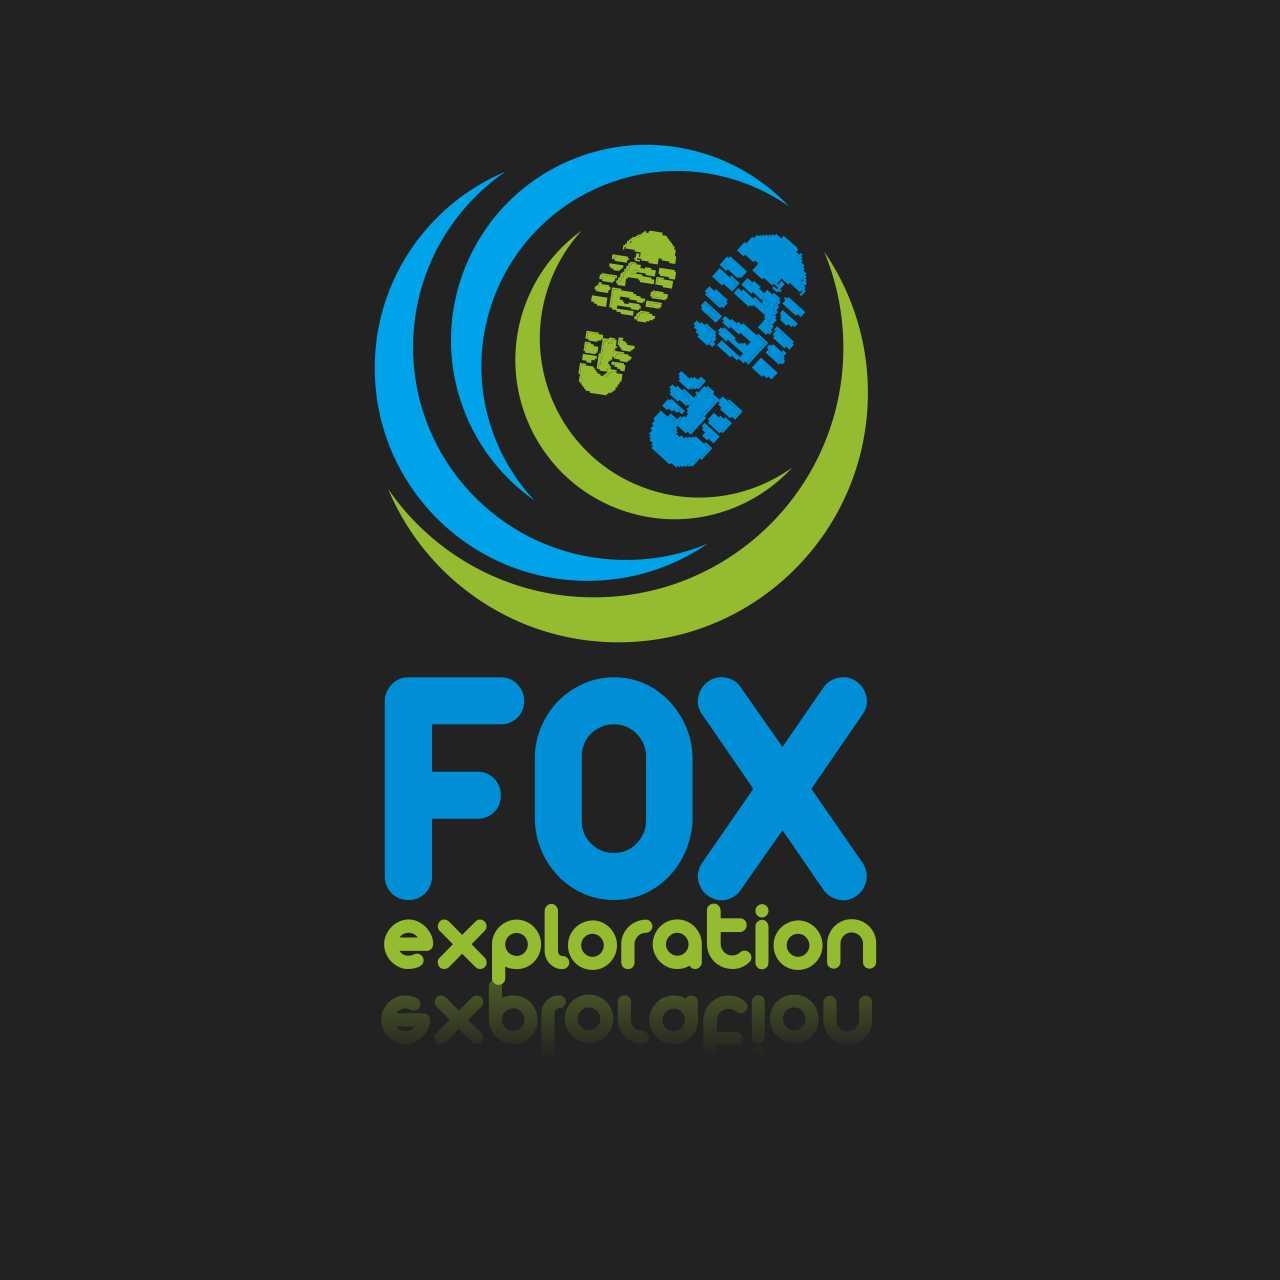 Logo Design by 0713022031 - Entry No. 13 in the Logo Design Contest Fox Exploration Logo.